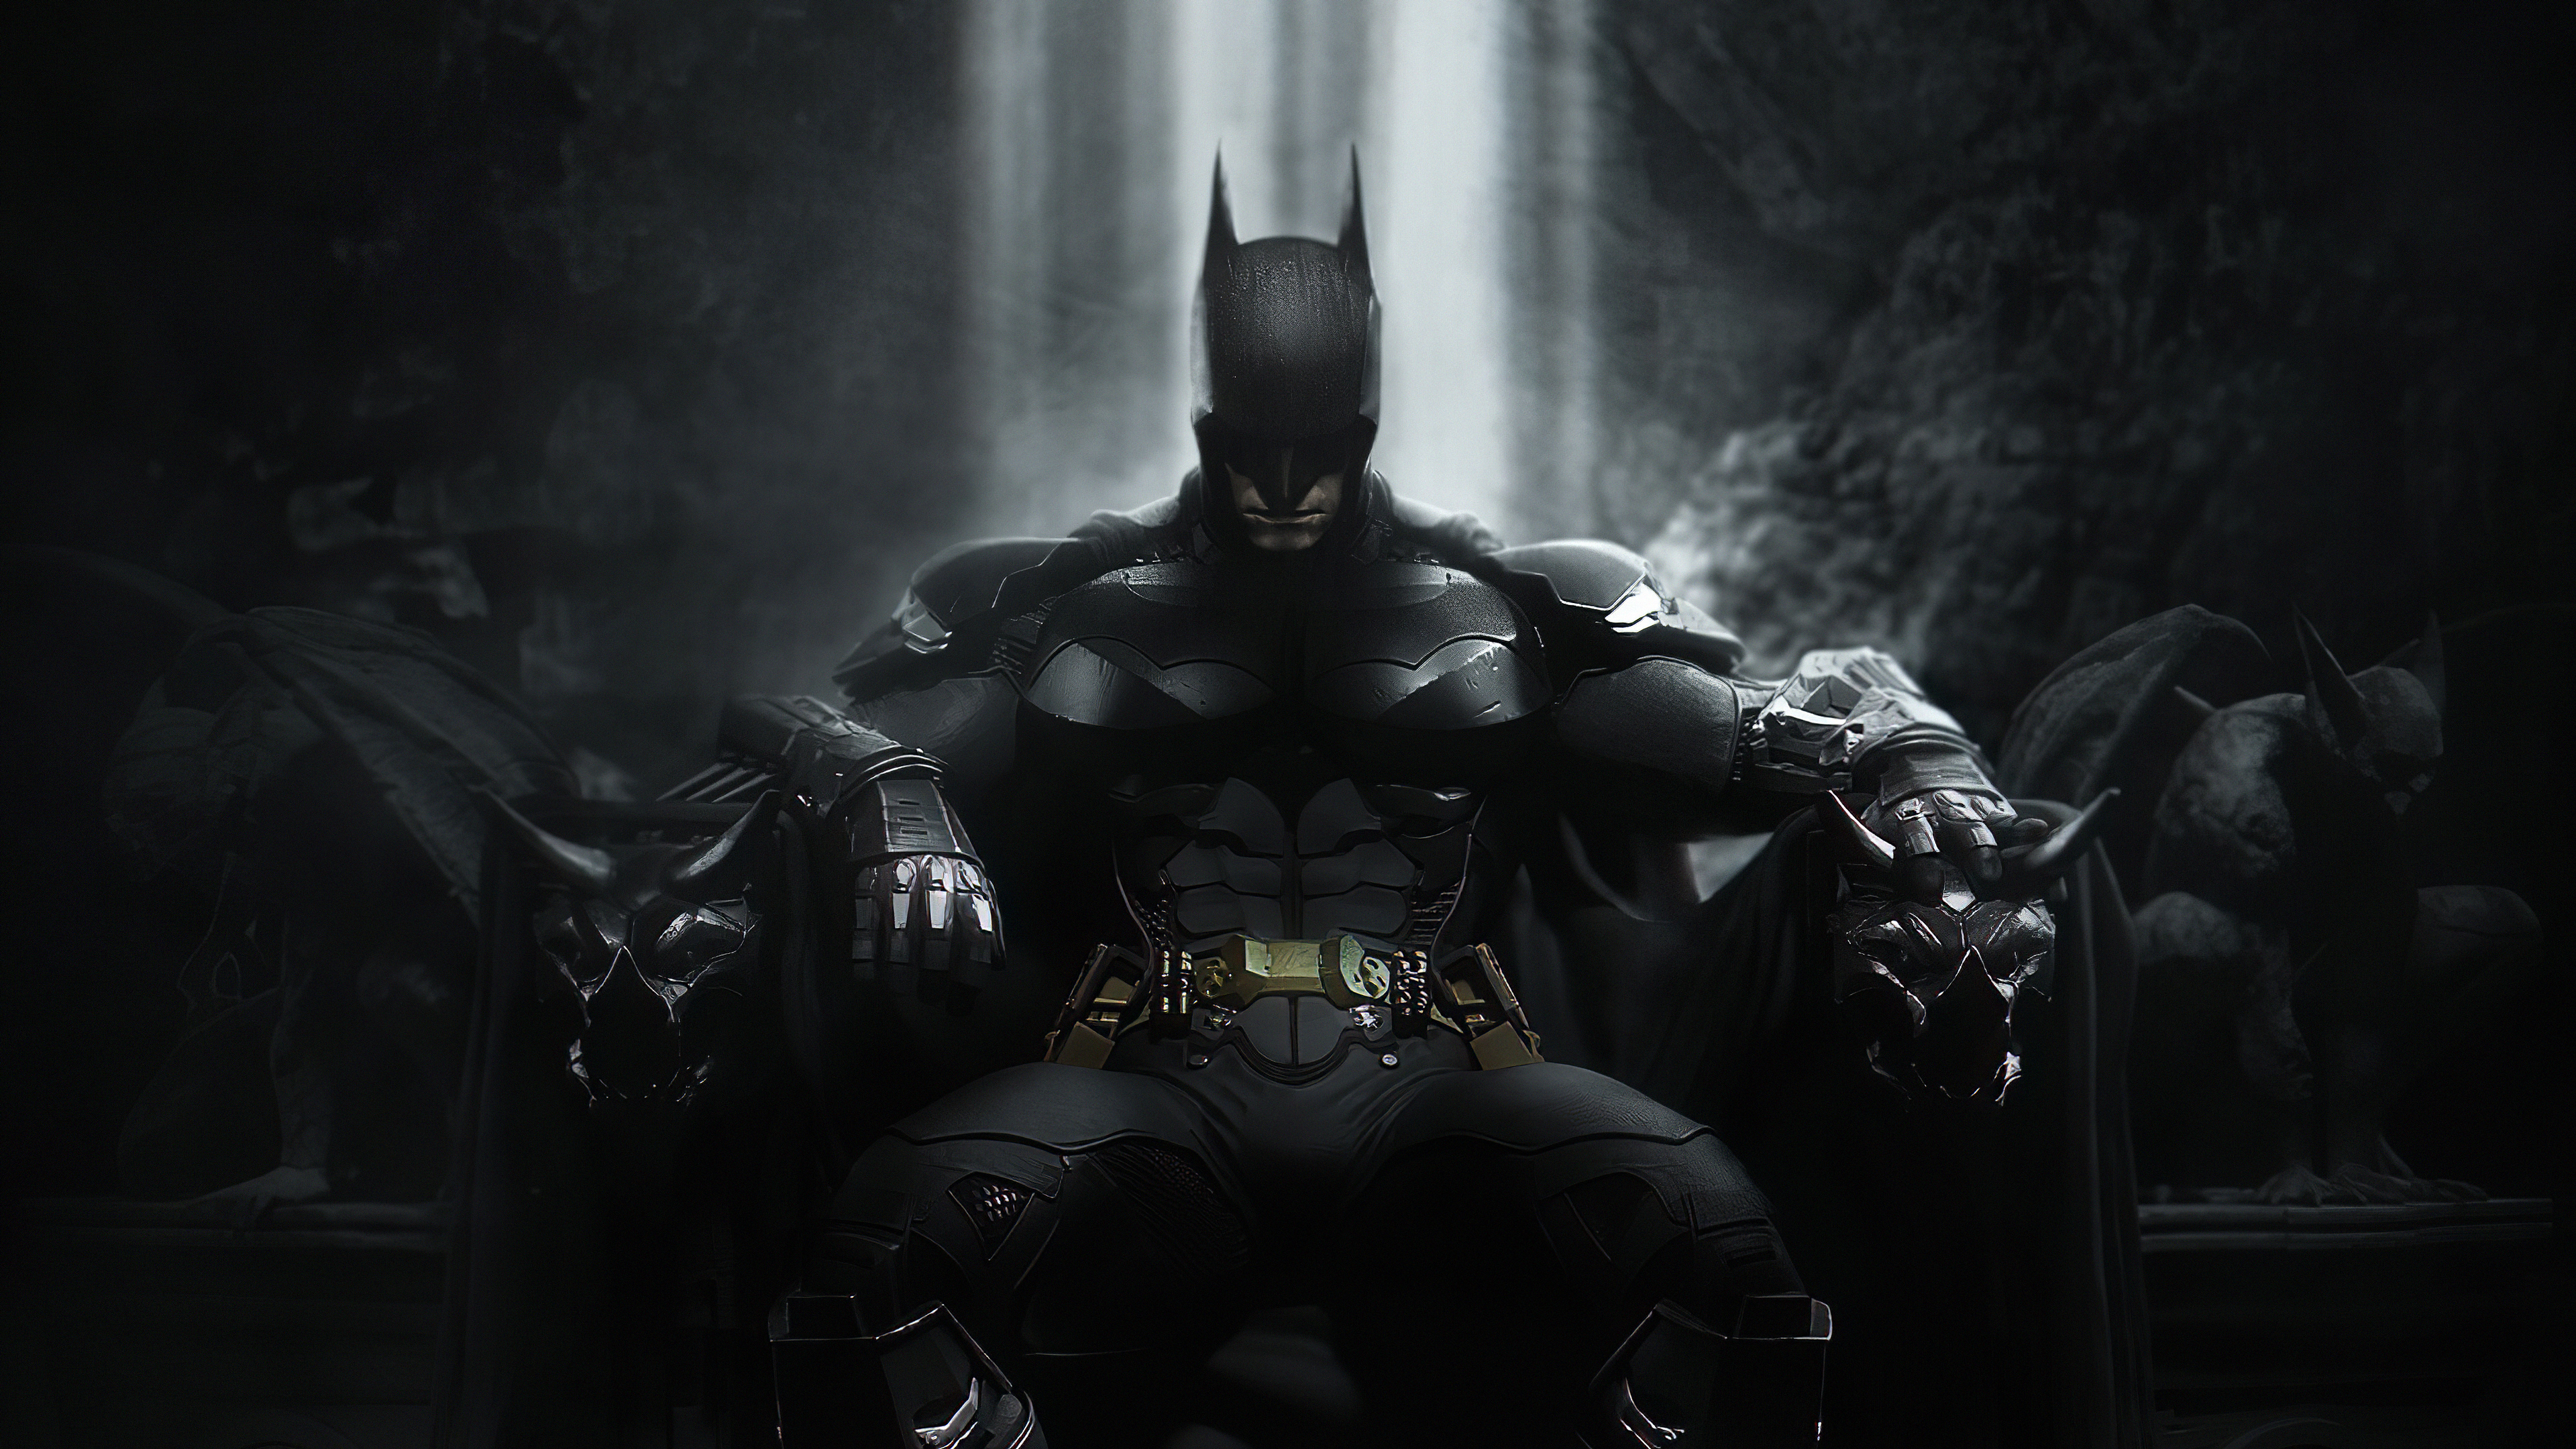 Batman 4k Ultra HD Duvar kağıdı | Arka plan | 3840x2160 | ID:1050135 - Wallpaper Abyss